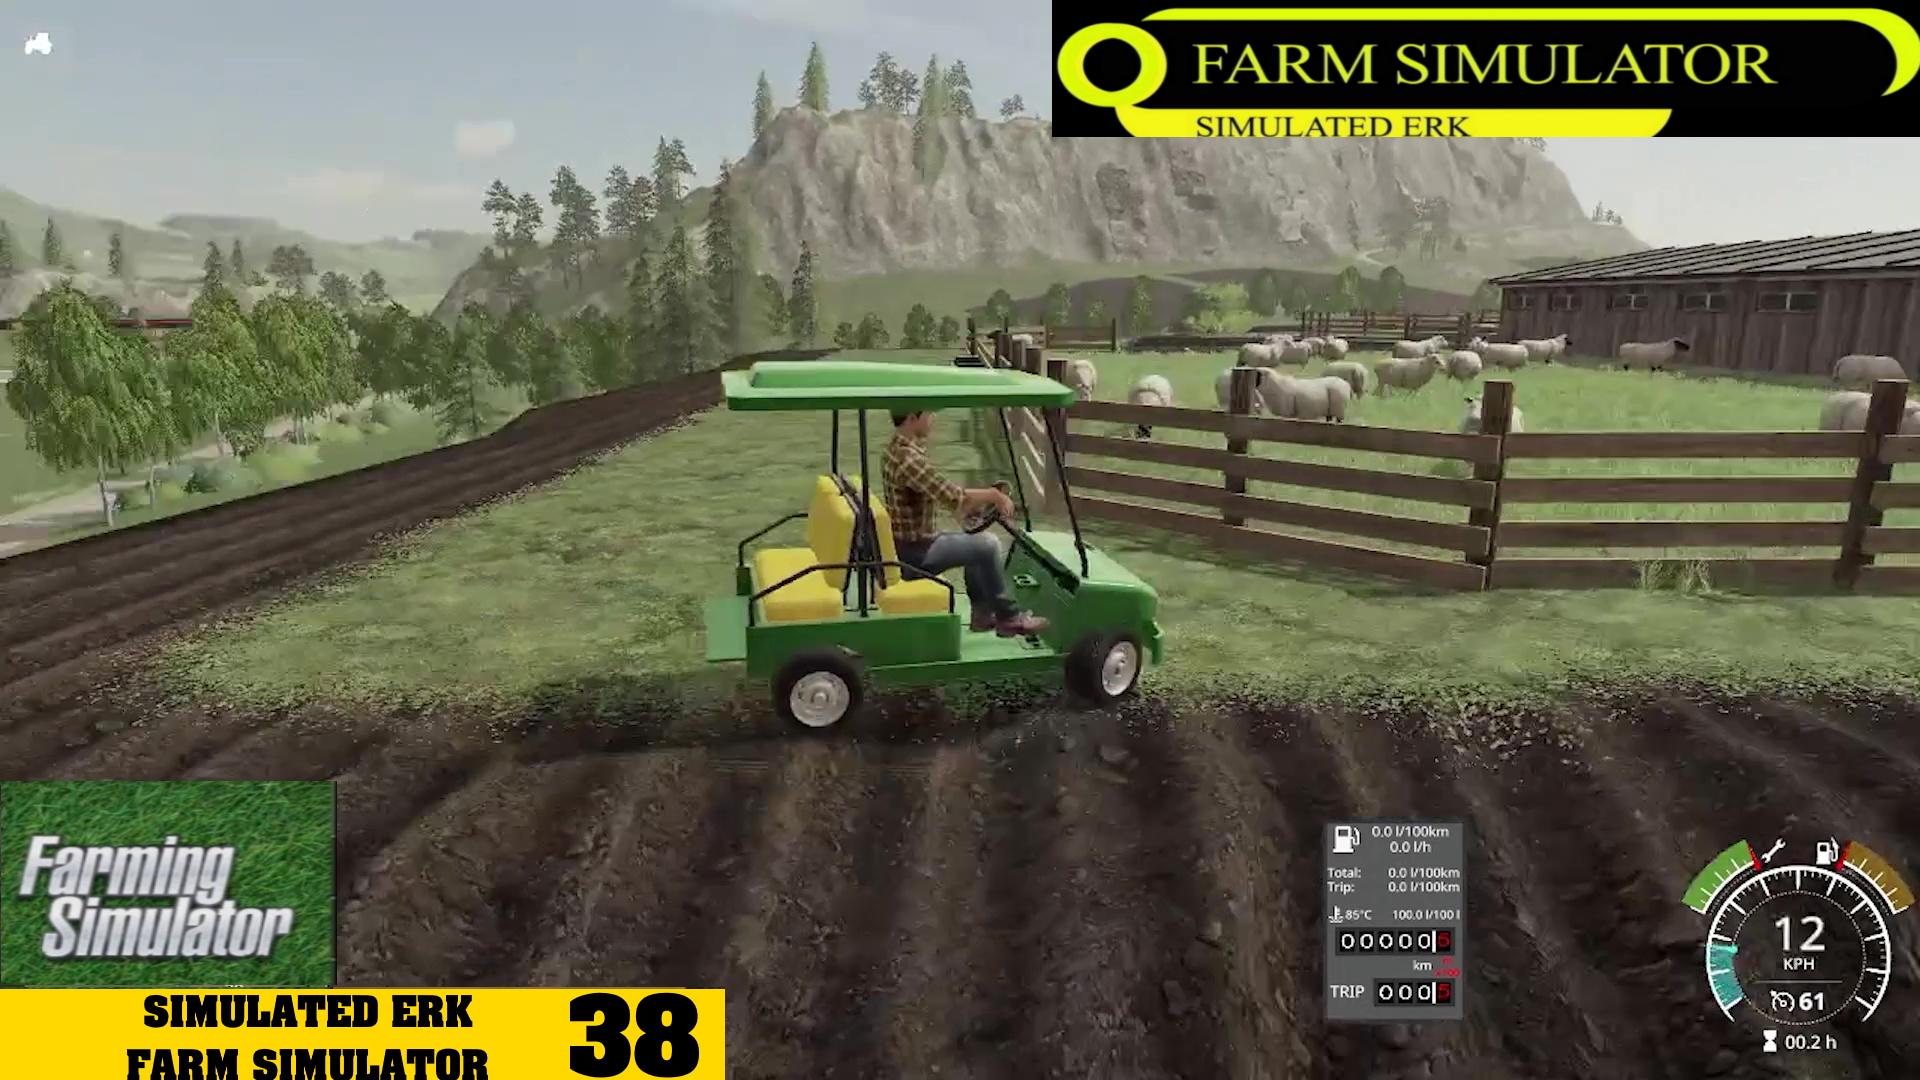 Simulated Erk: Farm Simulator episode 38   Showcasing The Farm